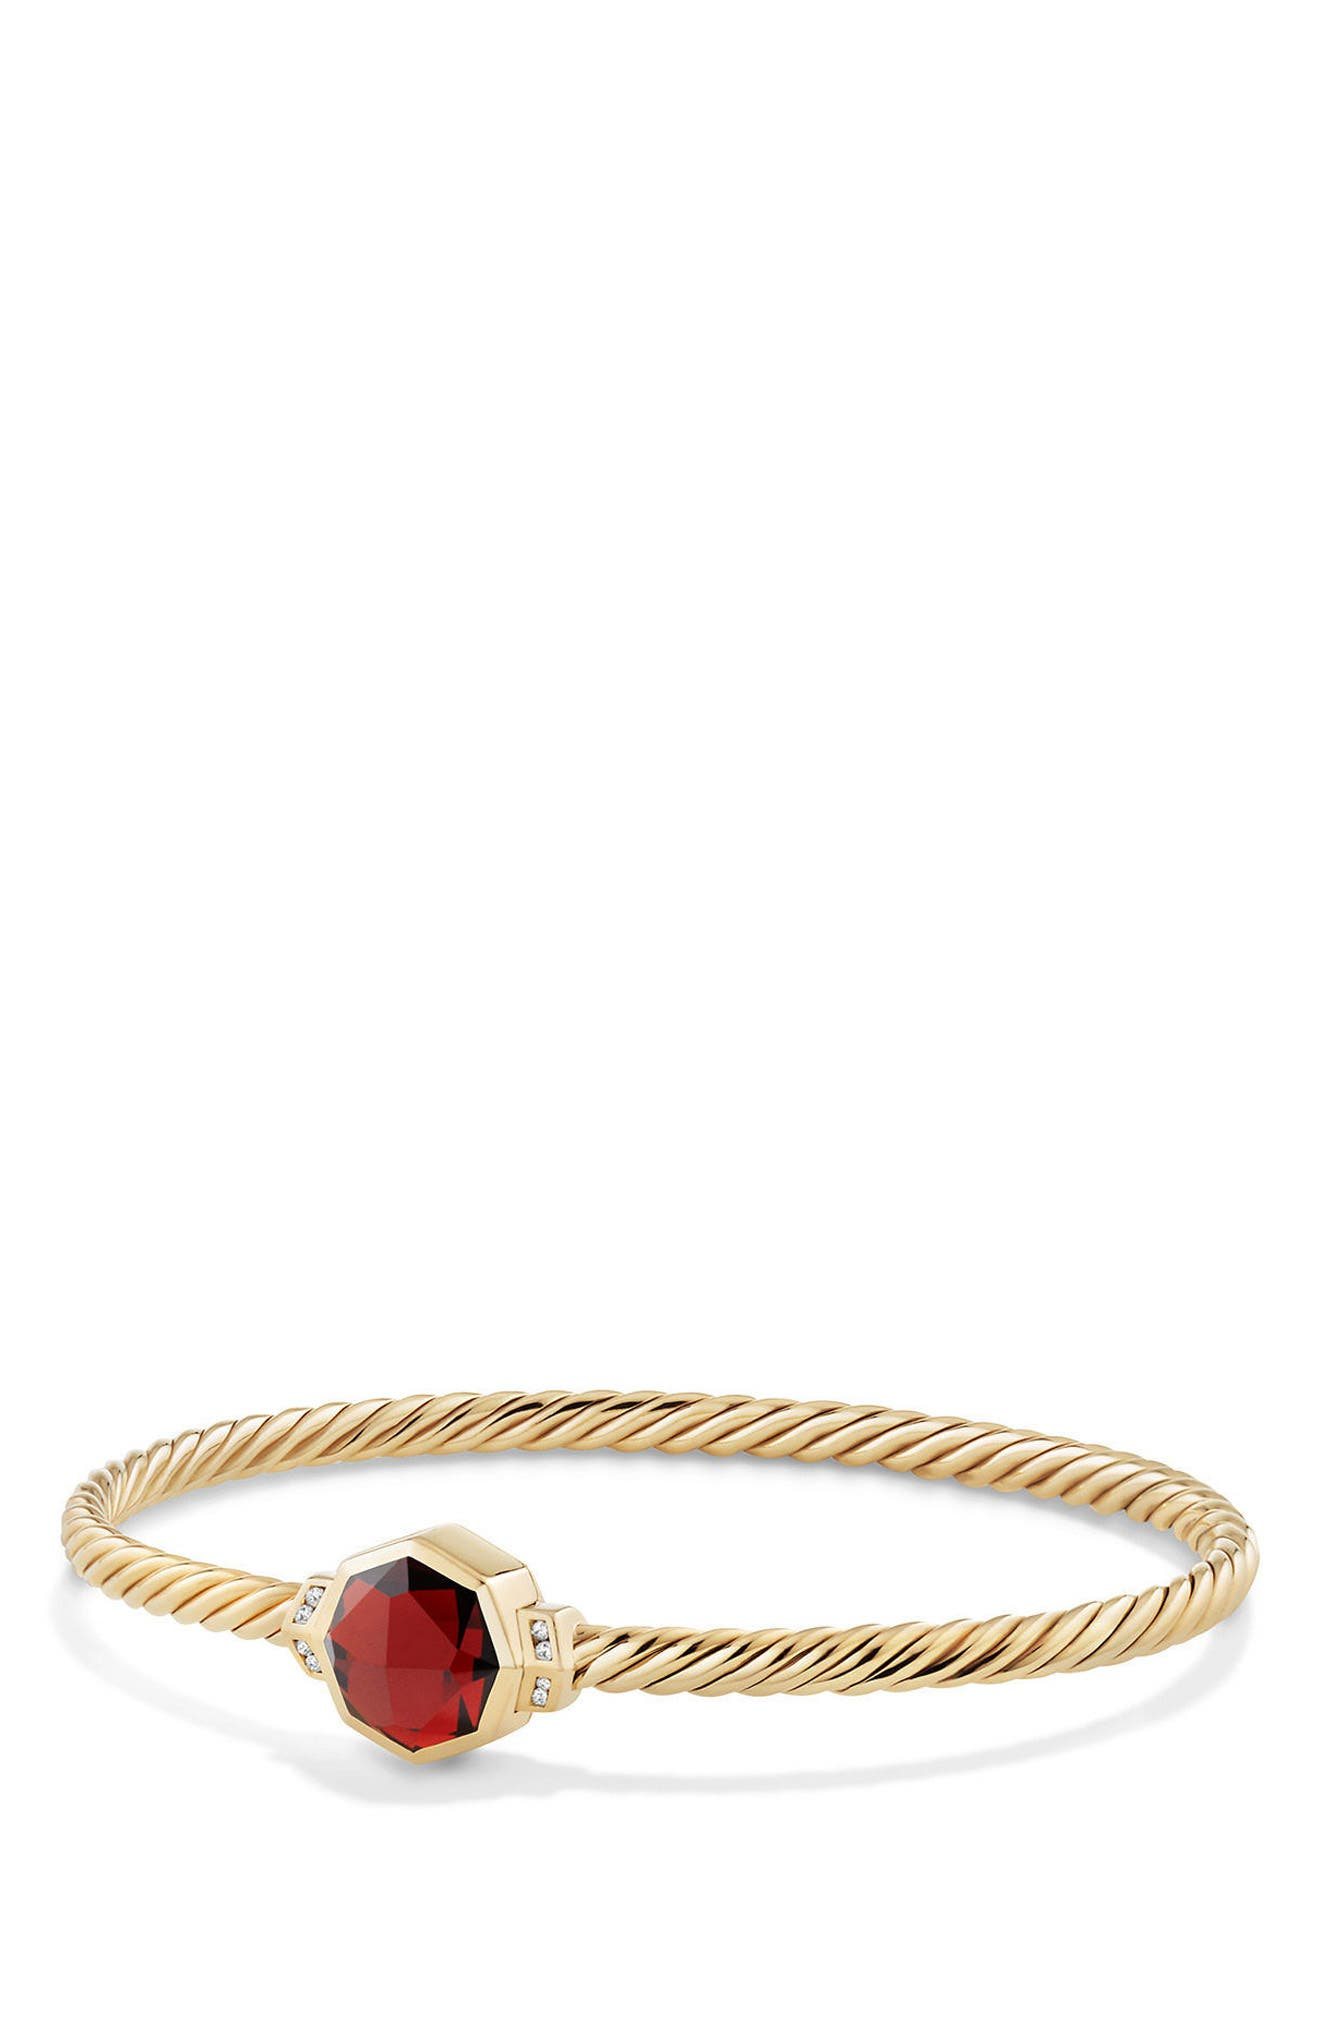 Main Image - David Yurman Guilin Octagon Bracelet with Diamonds in 18K Gold